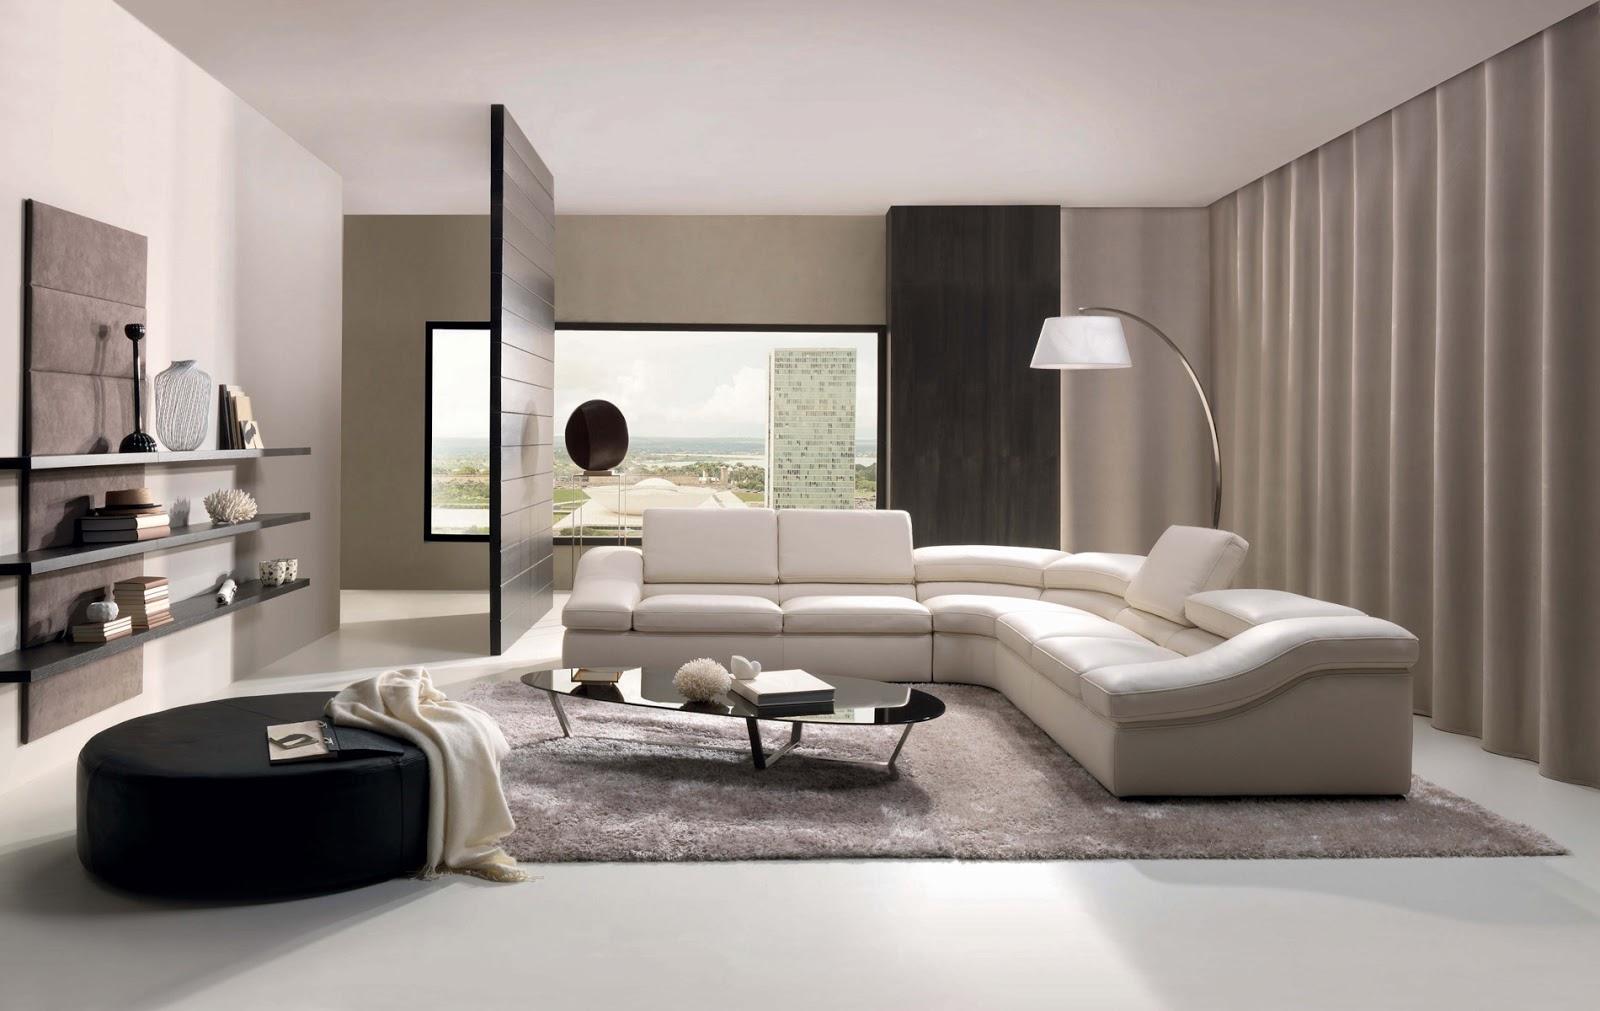 july 2013 | home interior design